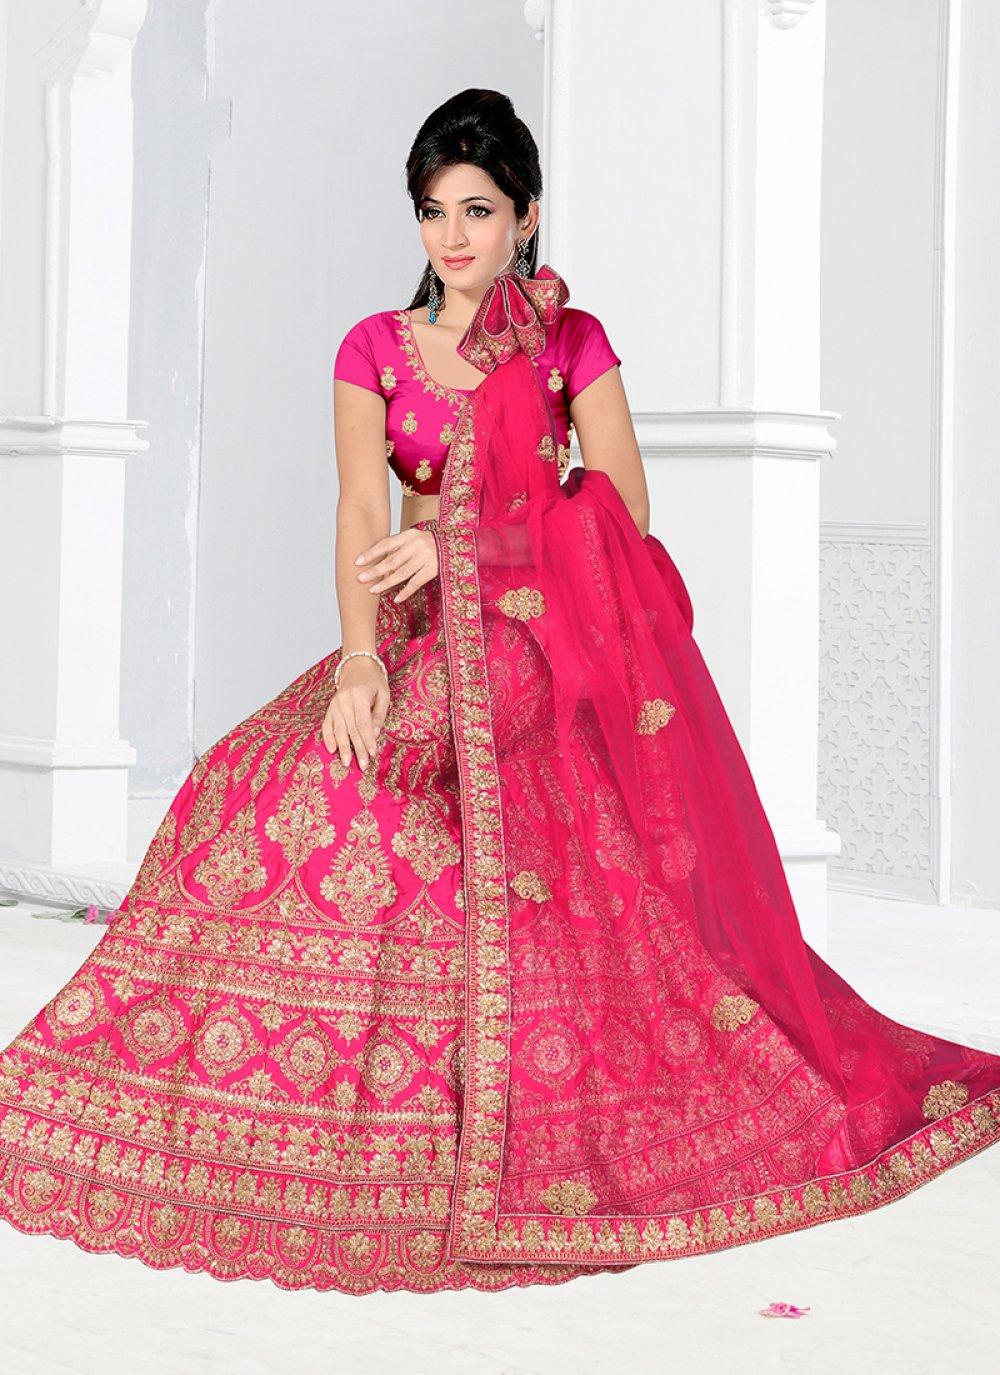 Satin Silk Embroidered Hot Pink Lehenga Choli